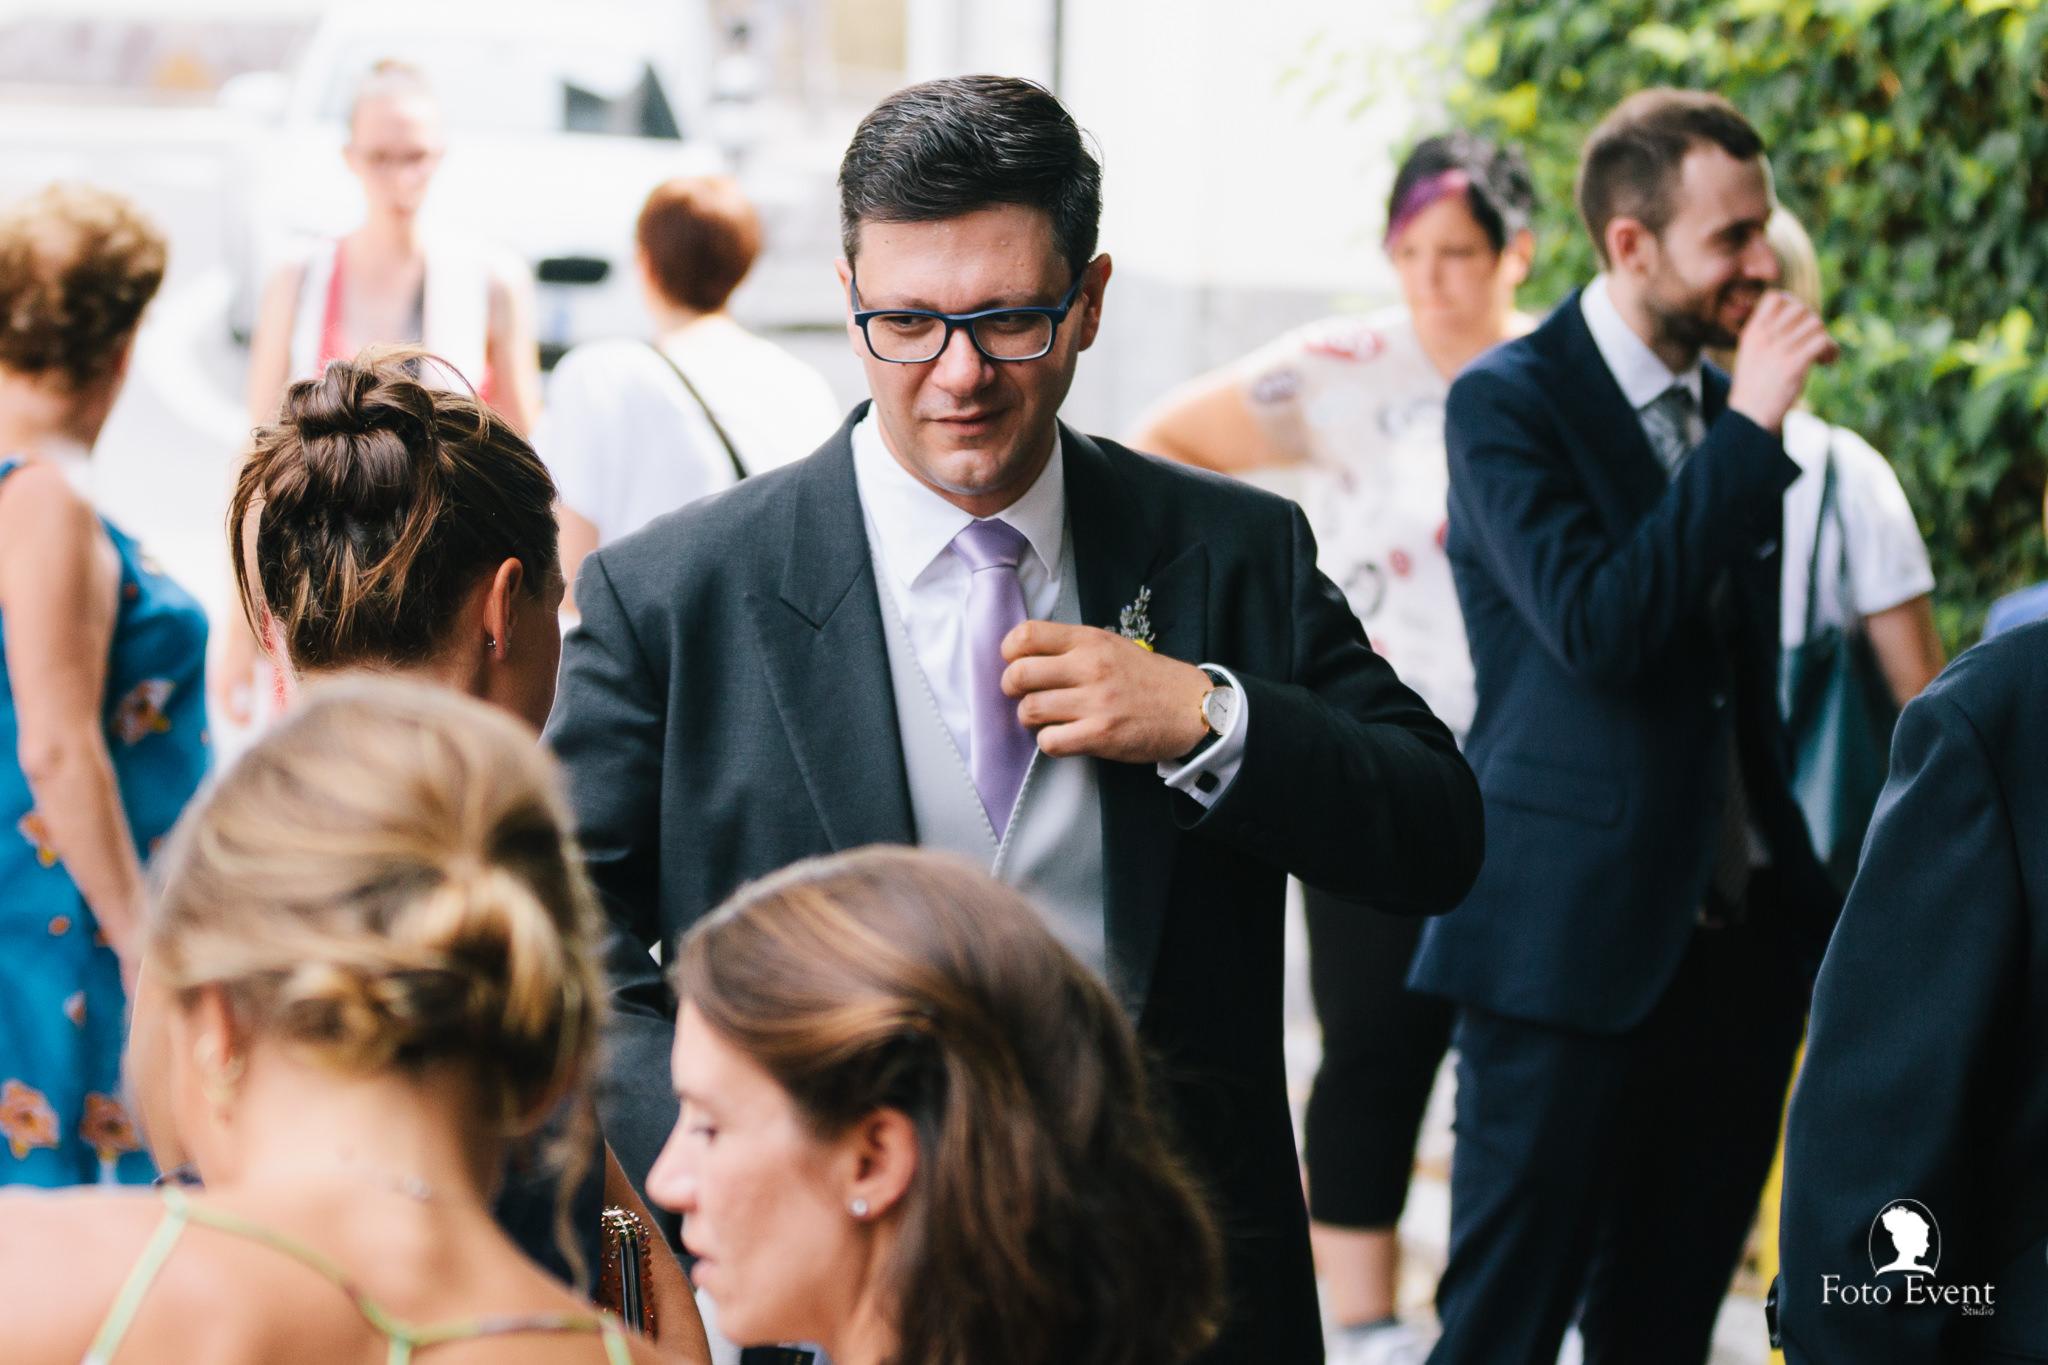 032-2019-07-27-Matrimonio-Valentina-e-Alessandro-Pettinari-zoom-217